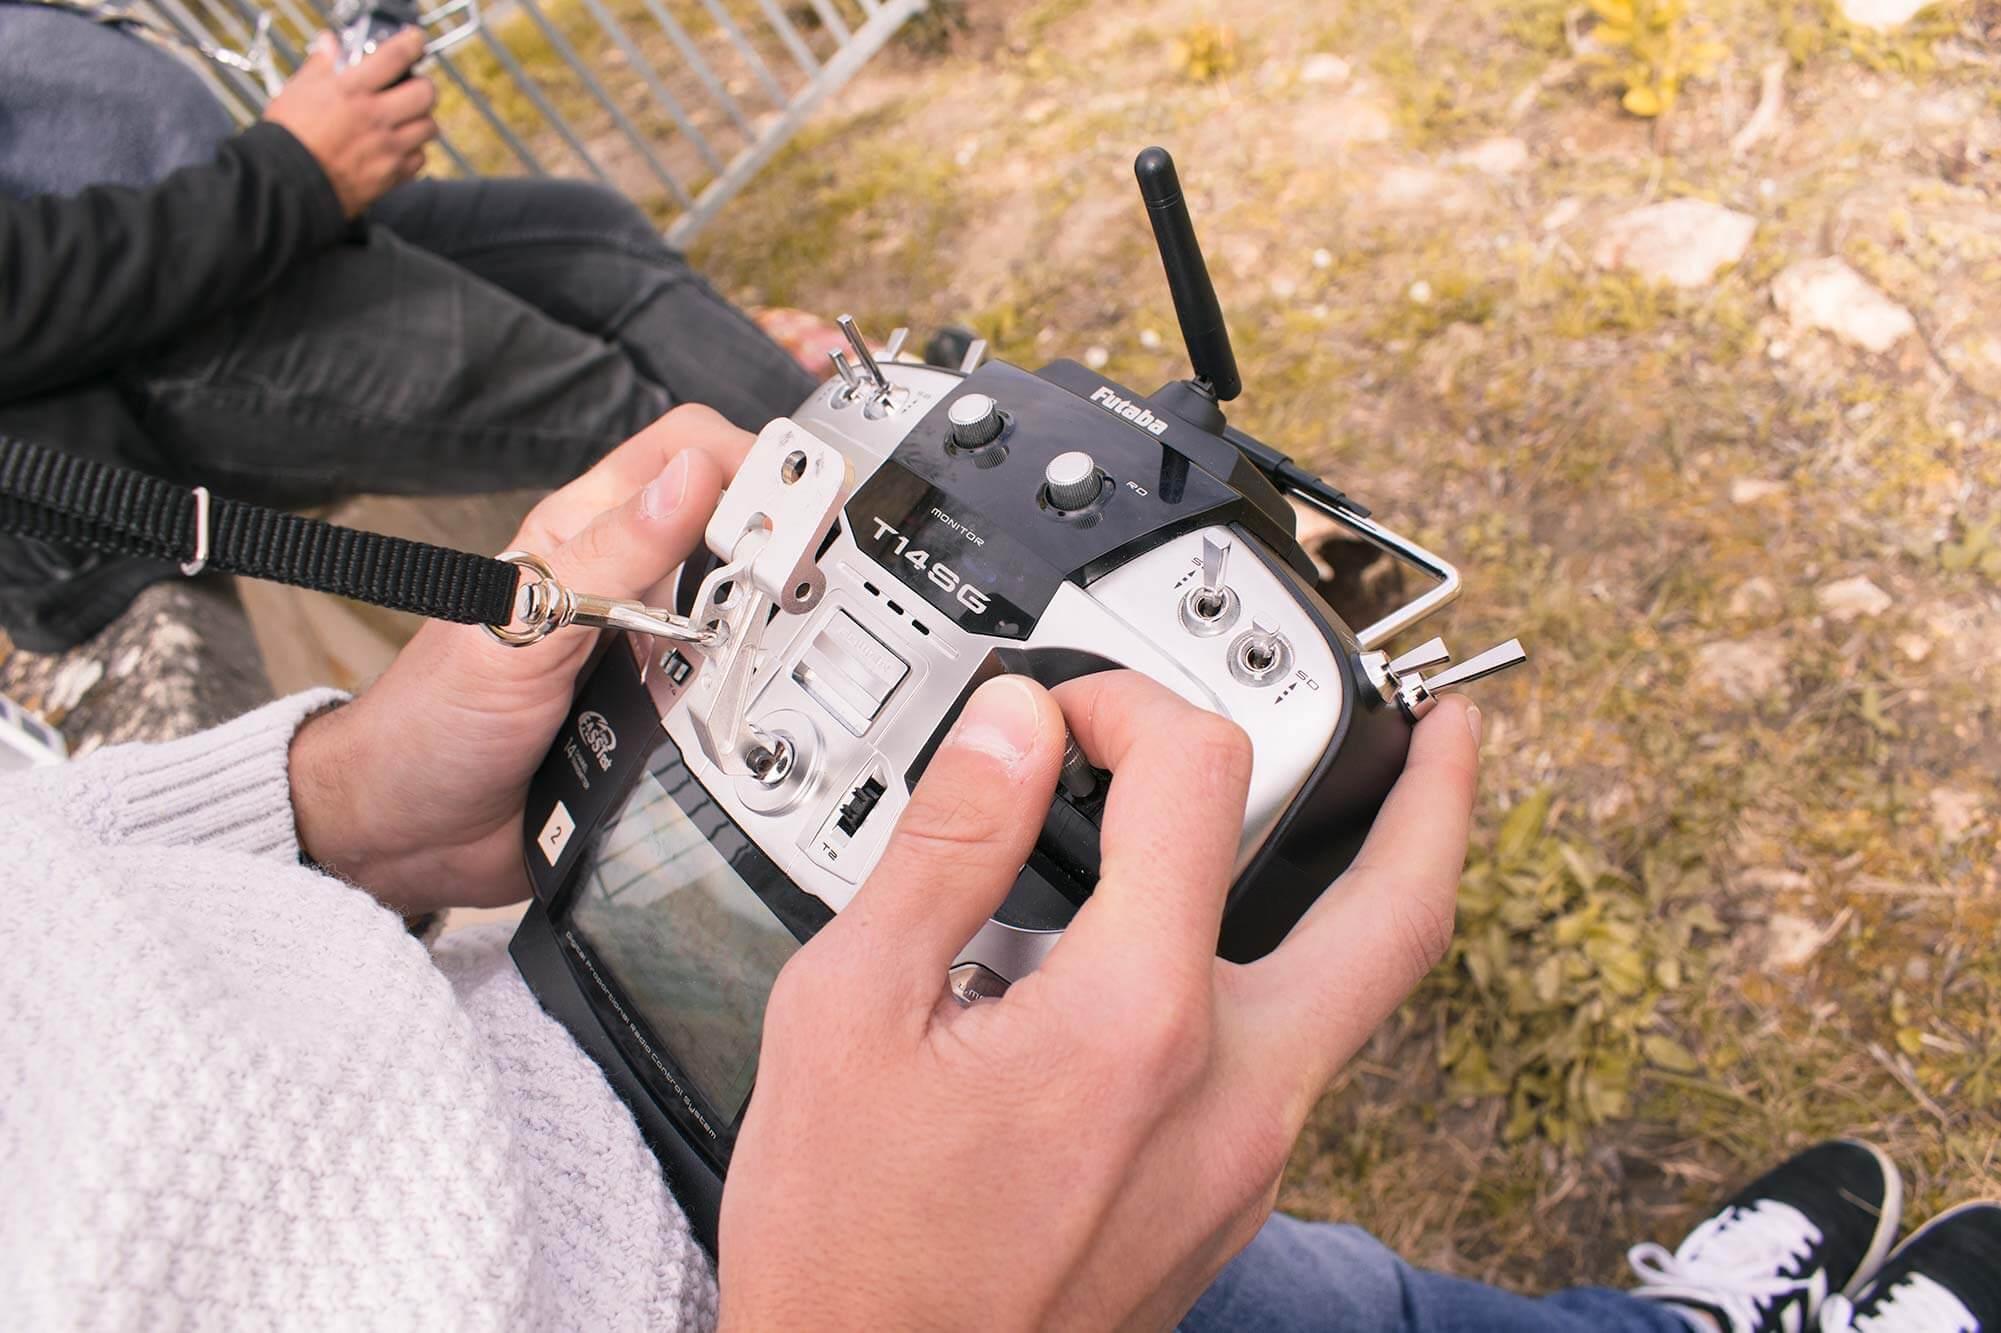 pilotage drone